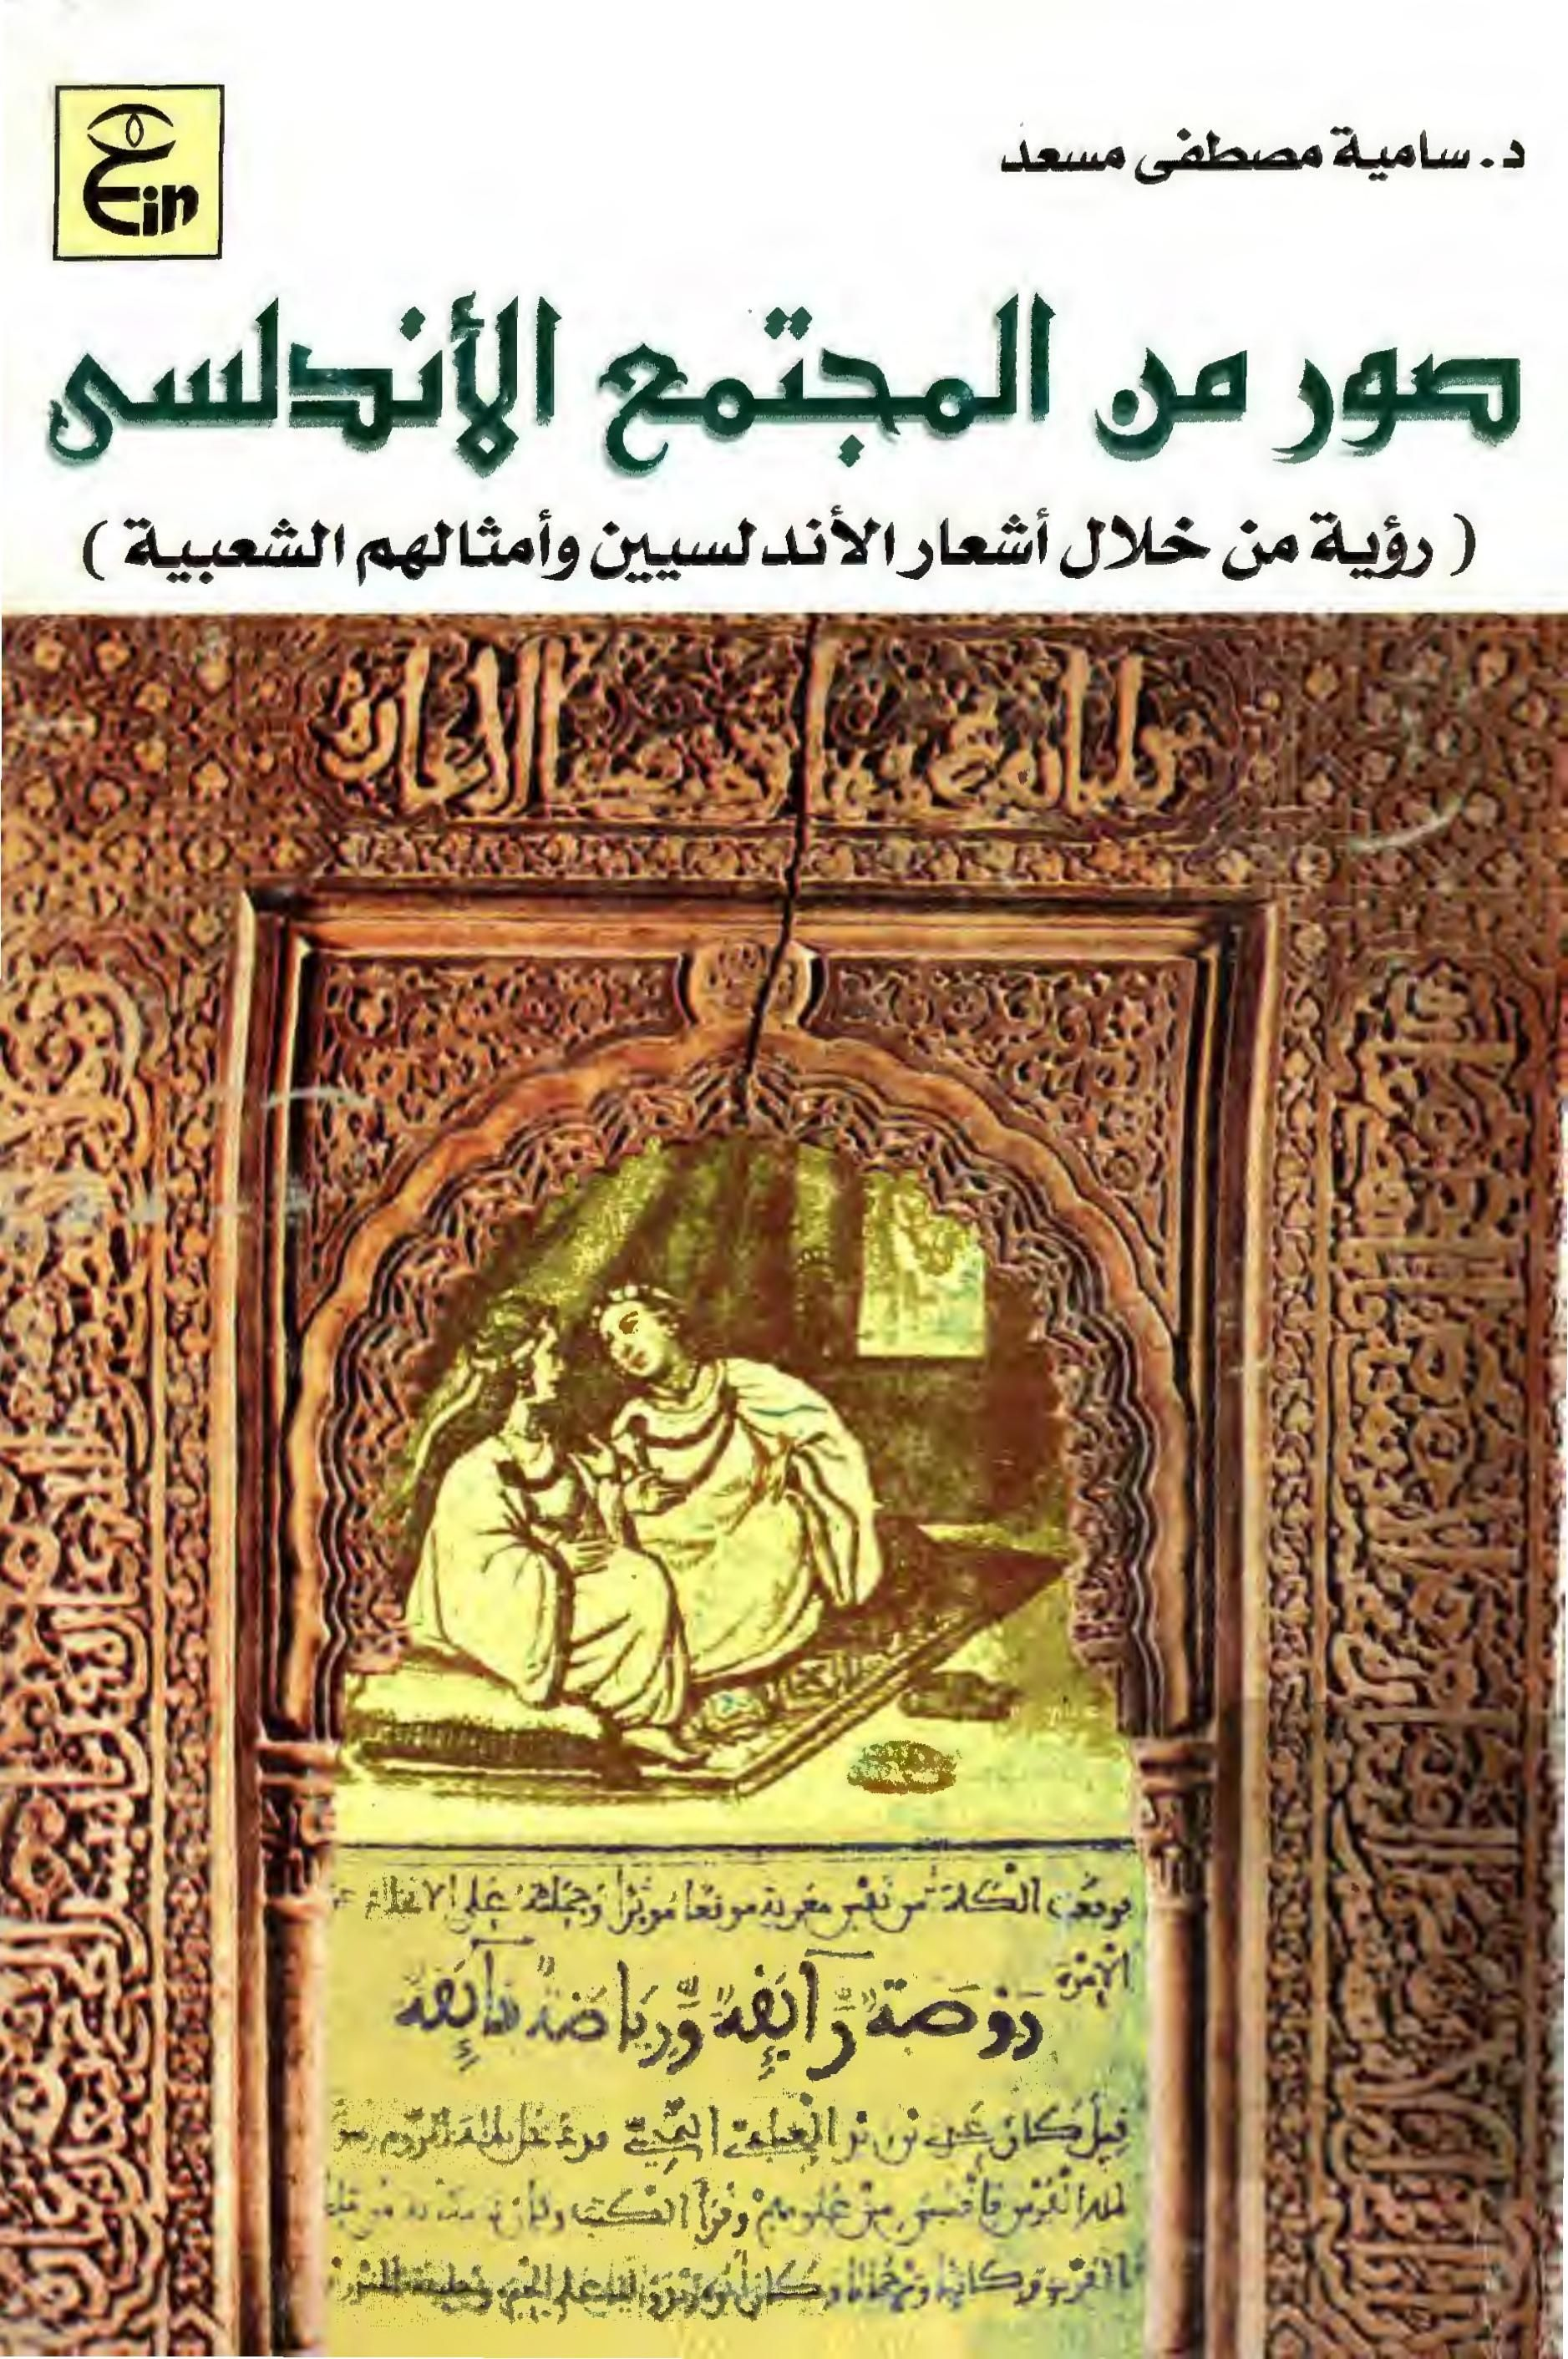 صور من المجتمع الأندلسي Free Download Borrow And Streaming Internet Archive Ebooks Free Books Arabic Books Book Club Books